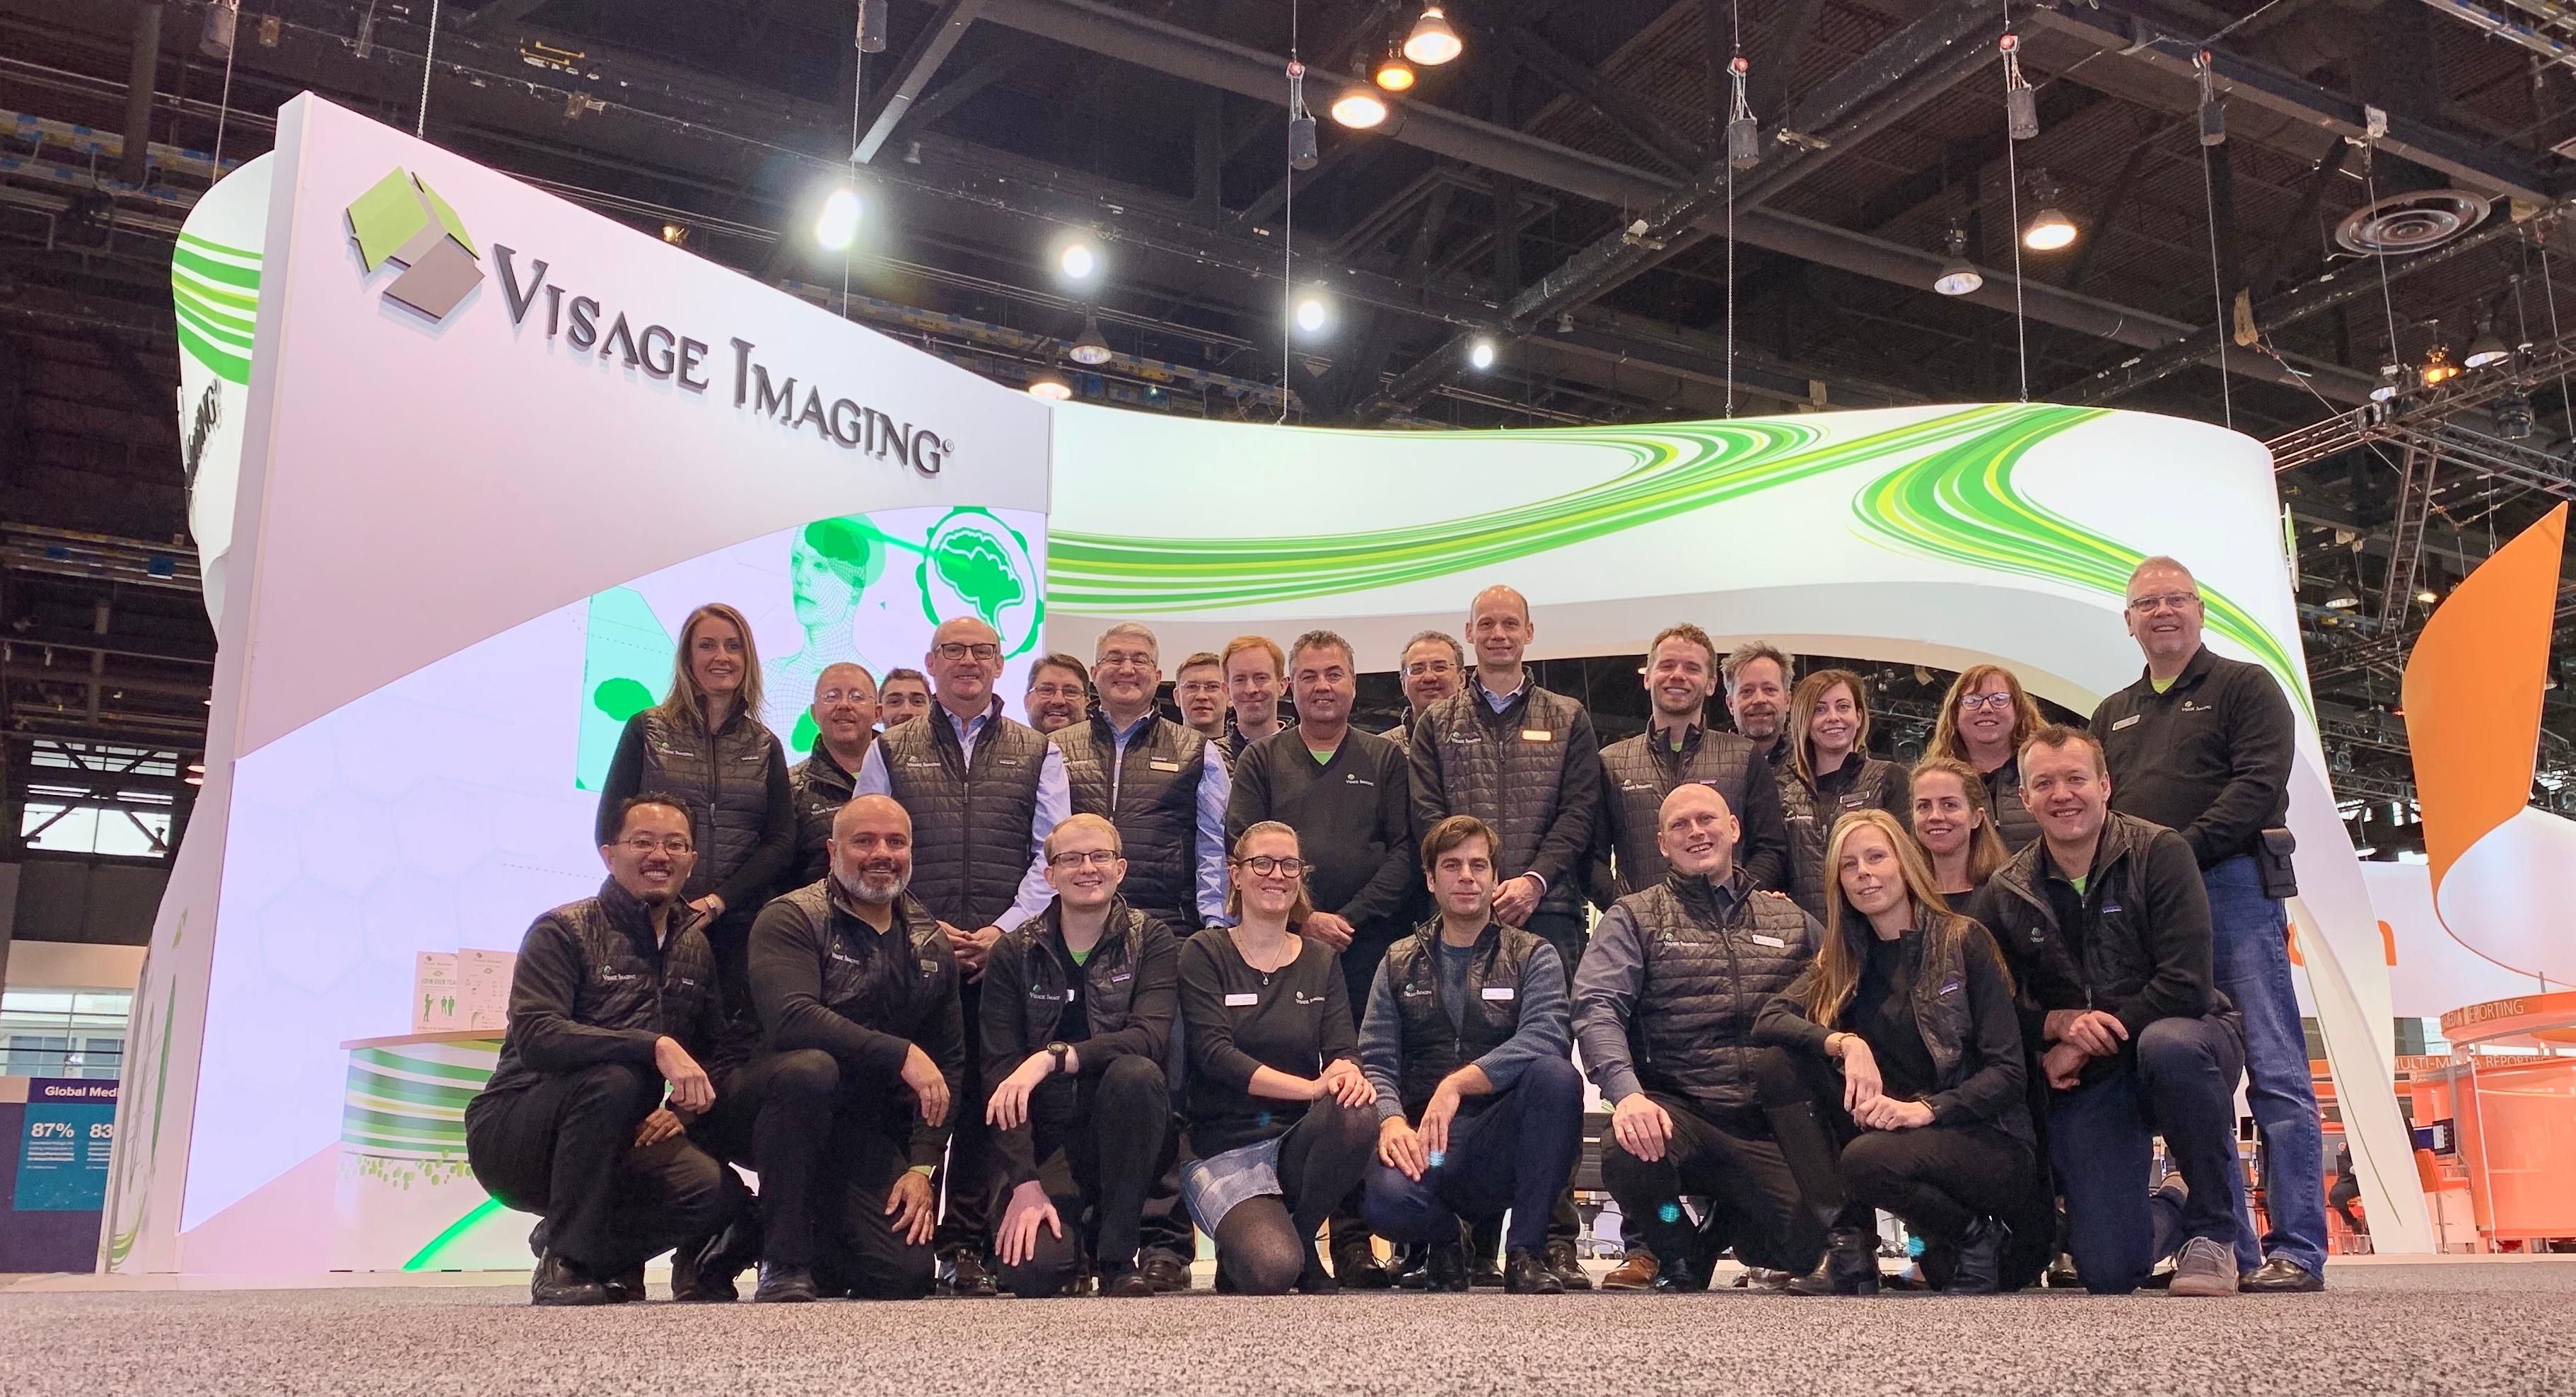 RSNA 2018 Visage Imaging Team